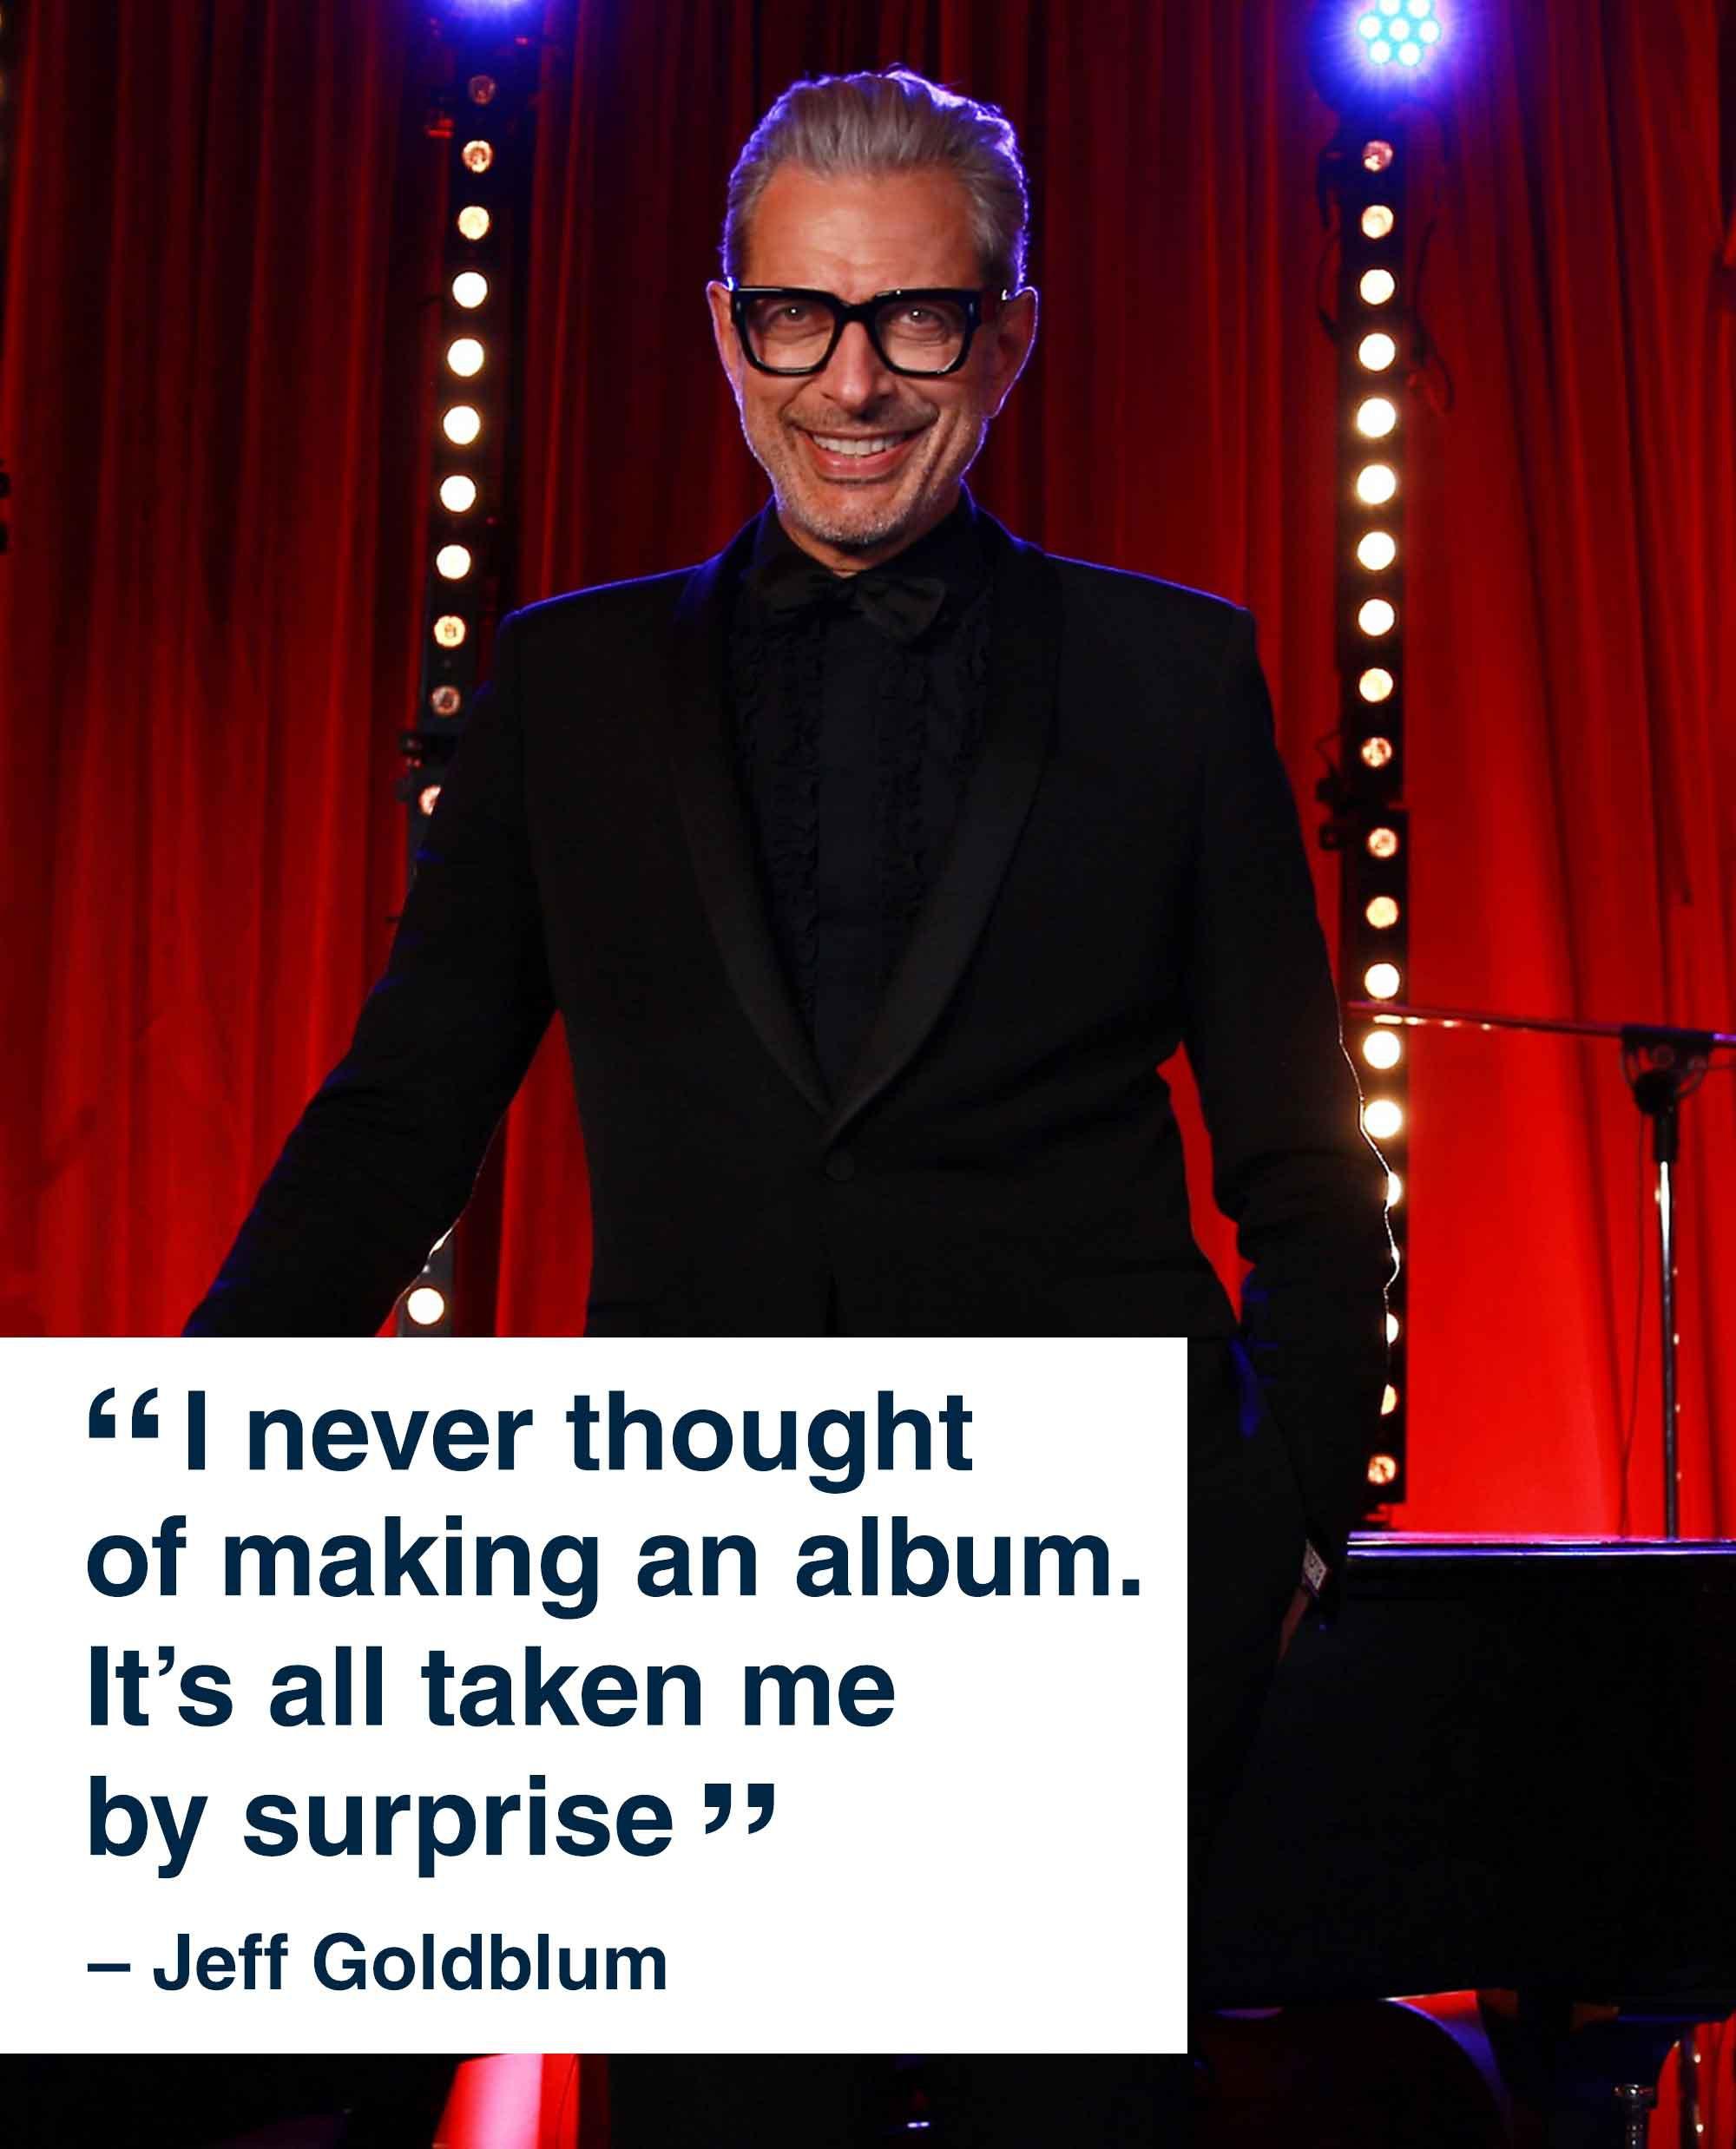 Jeff Goldblum NME